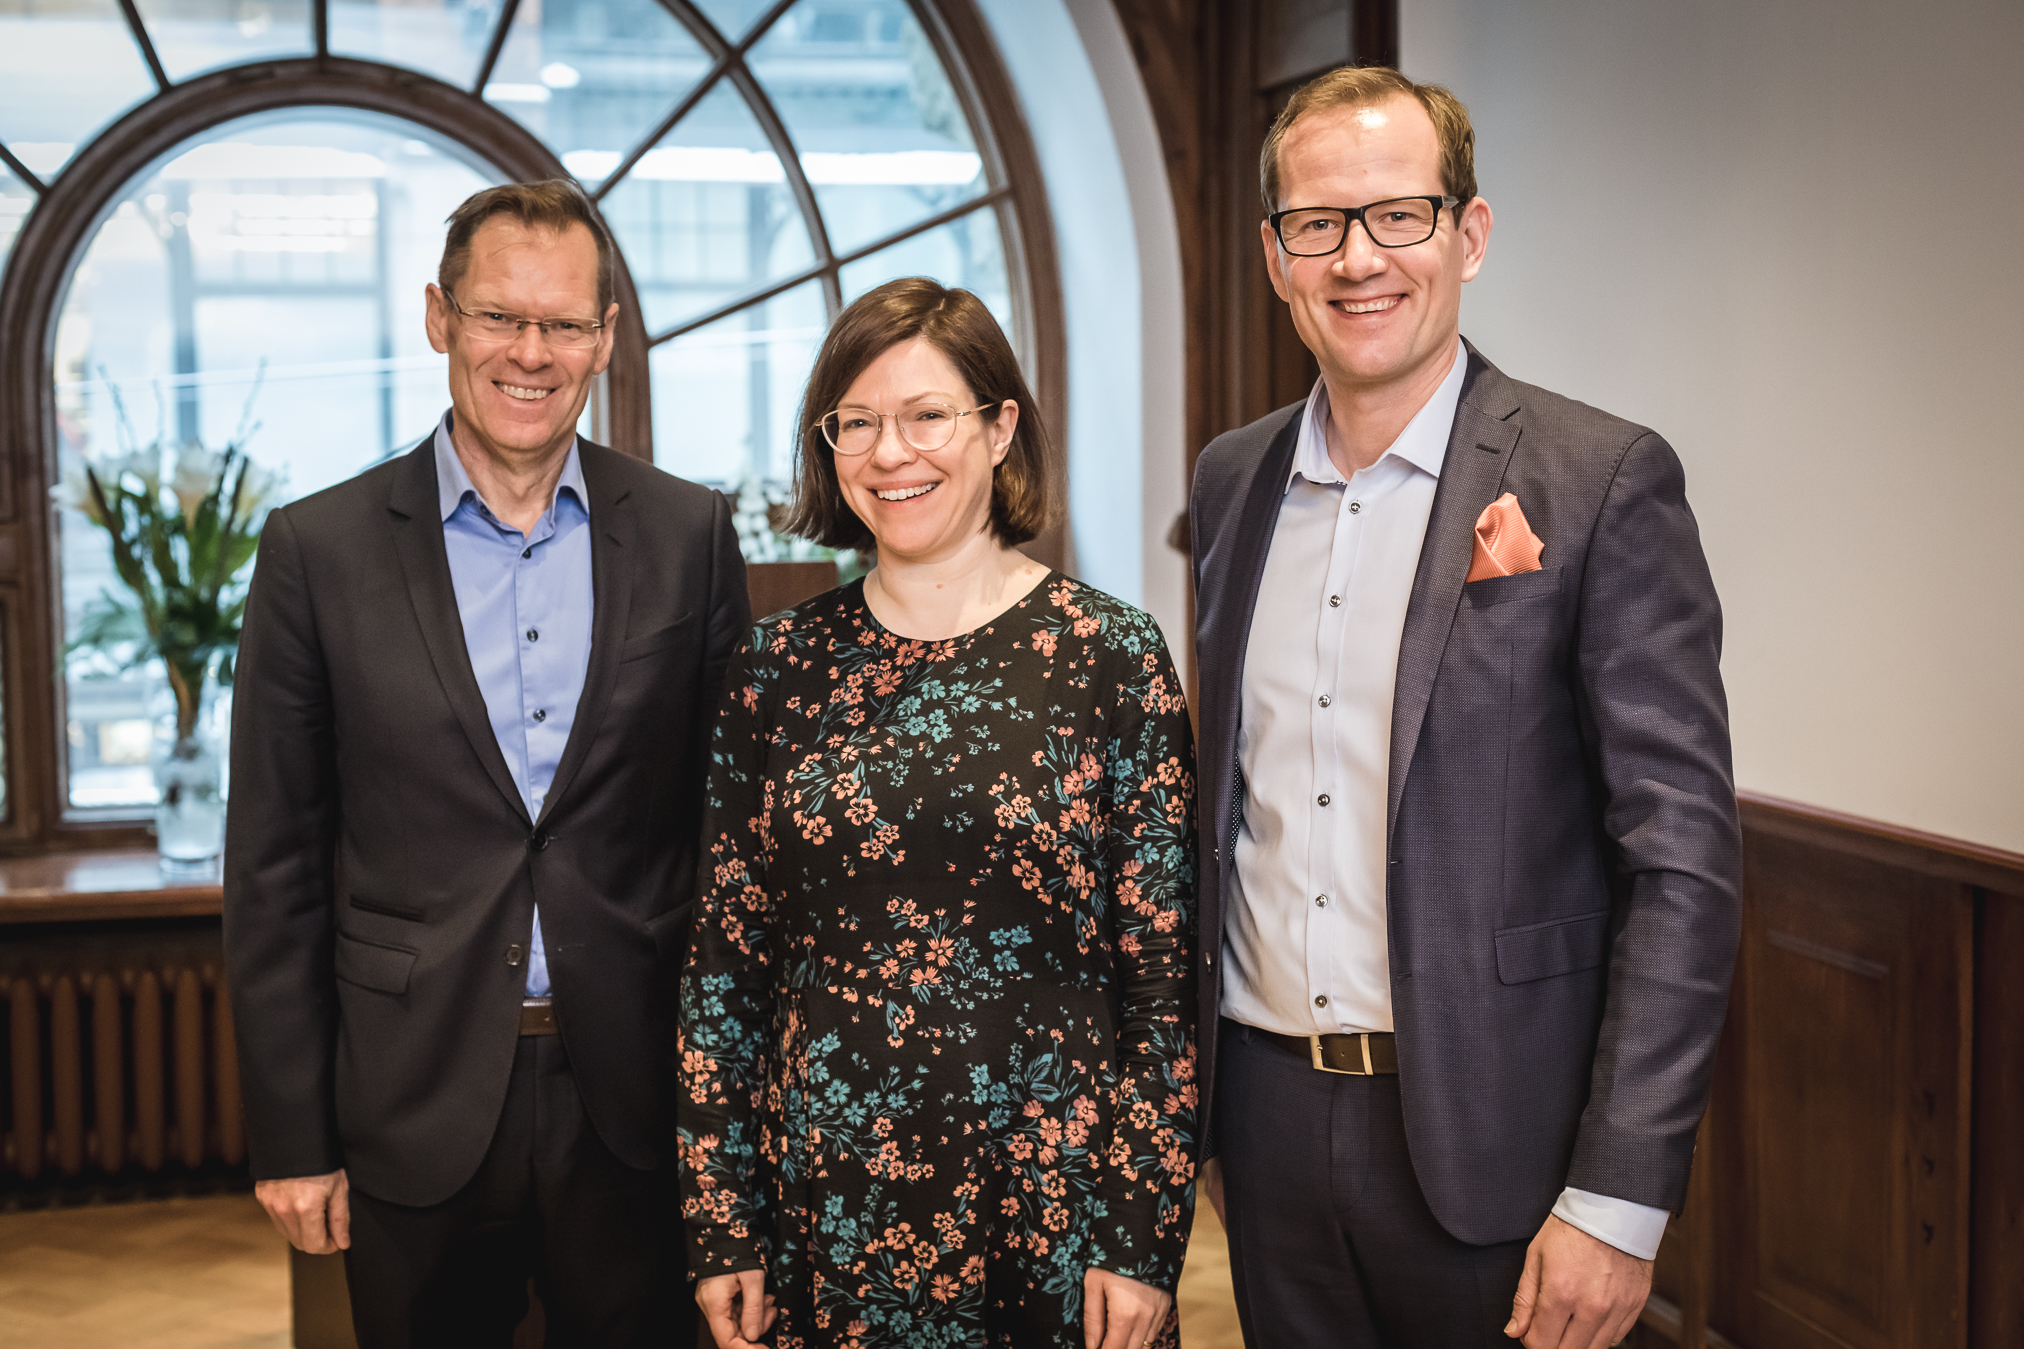 Professori Ari Ekroos, apulaispormestari Anni Sinnemäki ja Avaran toimitusjohtaja Mika Savolainen